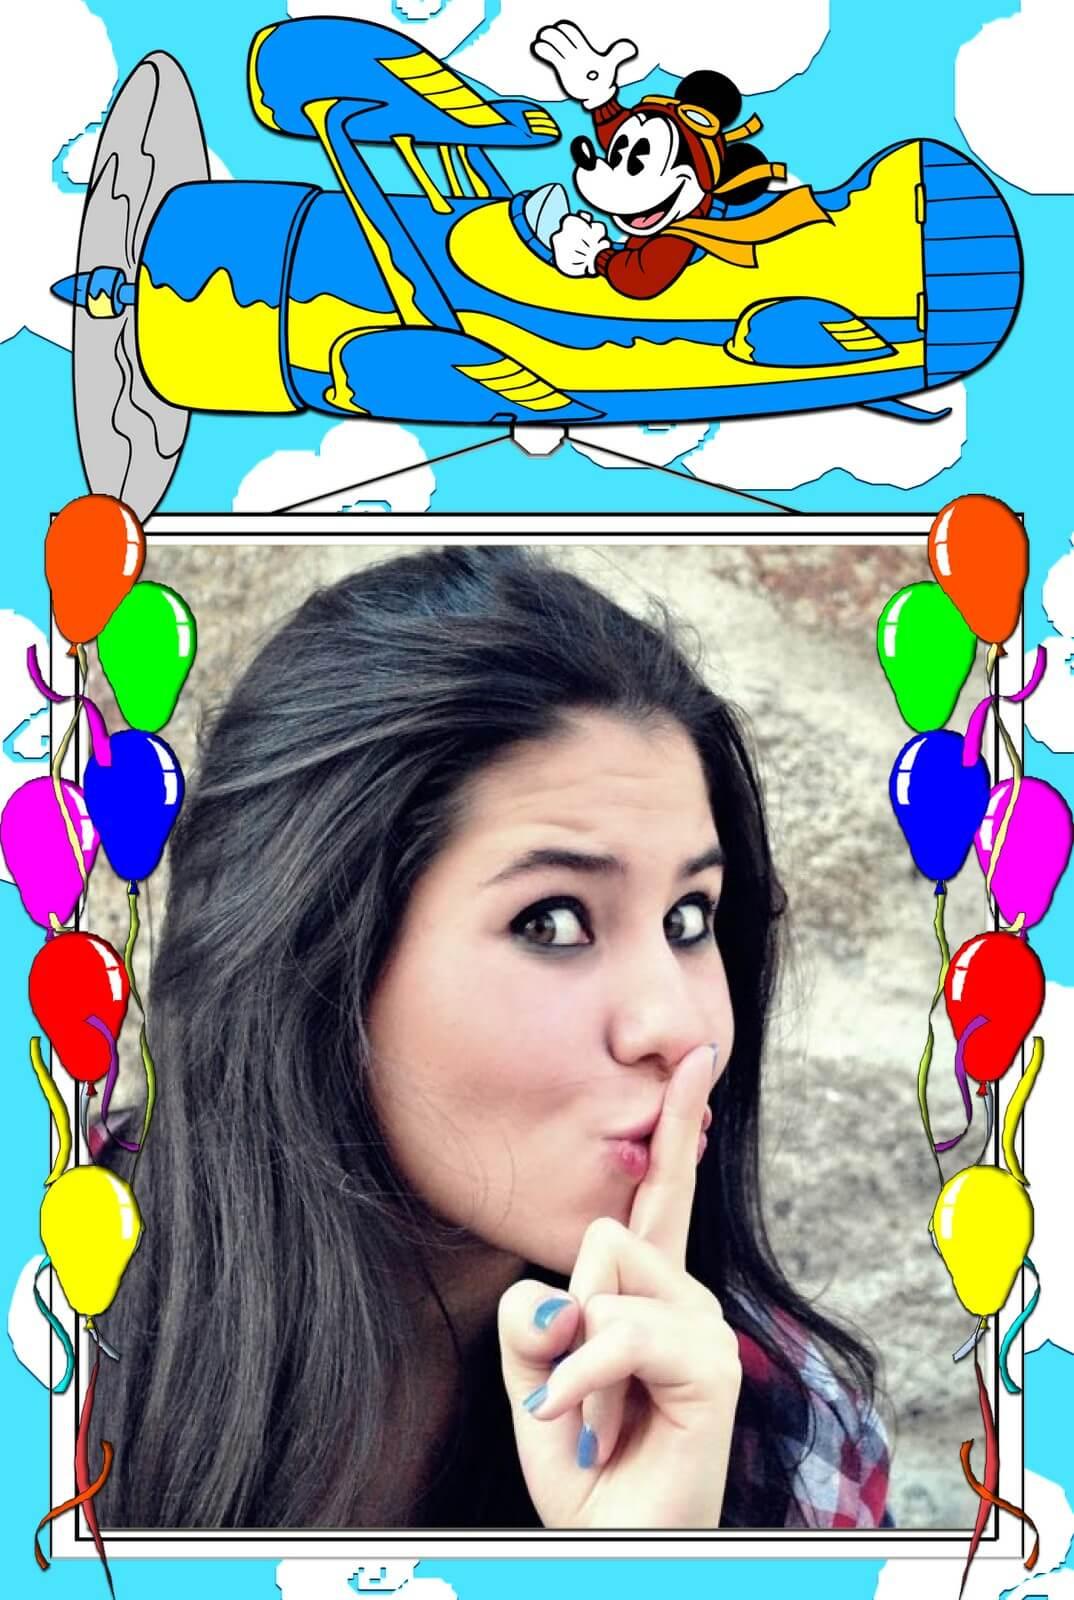 montagem-de-fotos-de-aniversario-festa-do-mickey